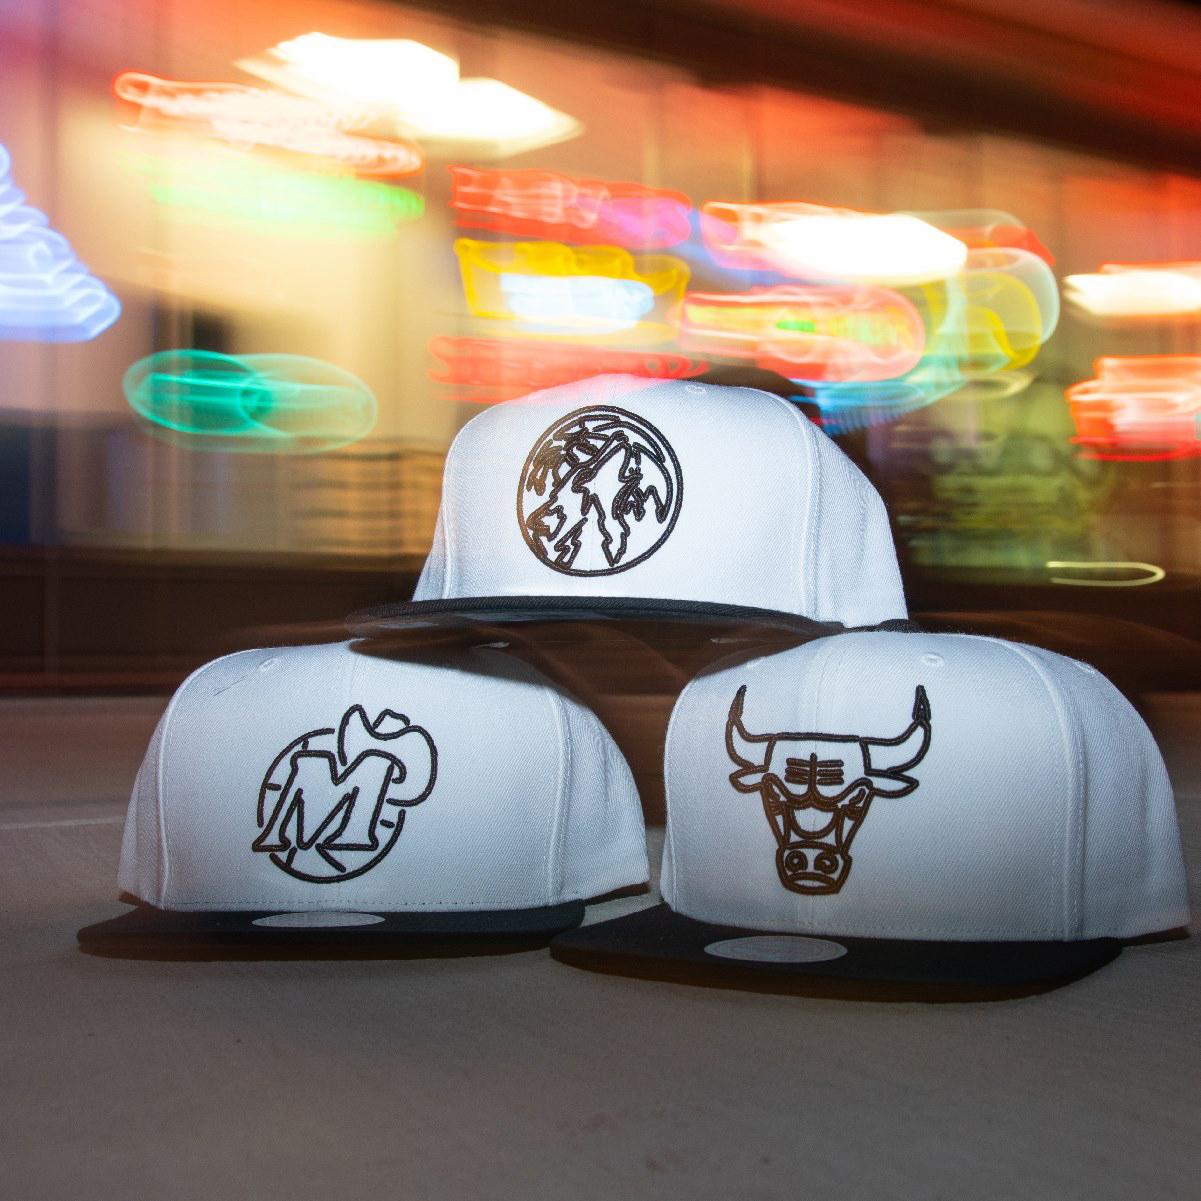 4e30e576523 ... official store jordan 11 concord nba snapback hats b47ab 5c2b5